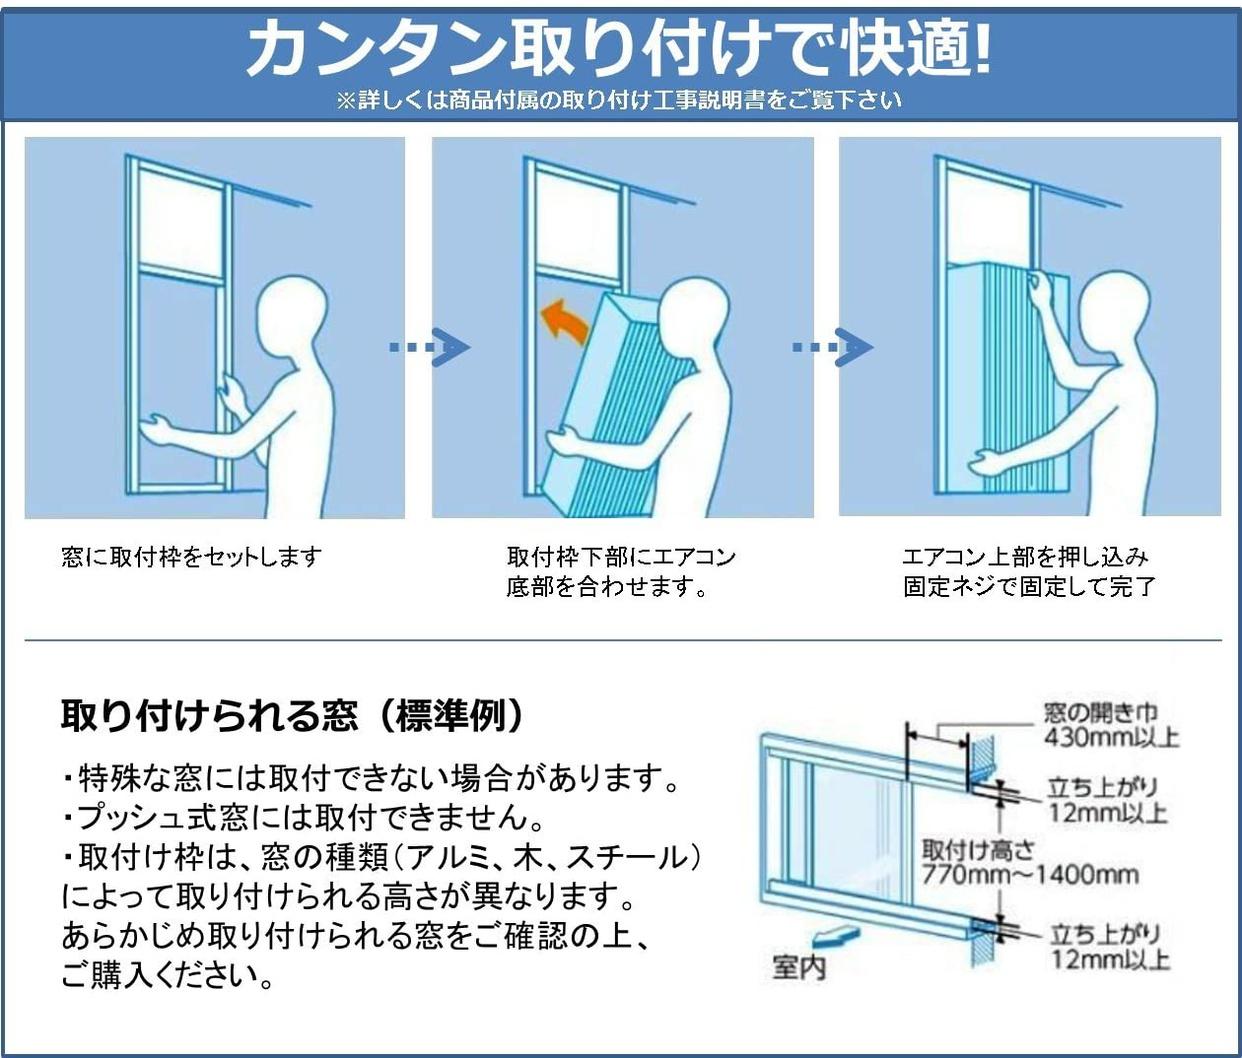 KOIZUMI(コイズミ) ルームエアコン KAW-1602/Wの商品画像5